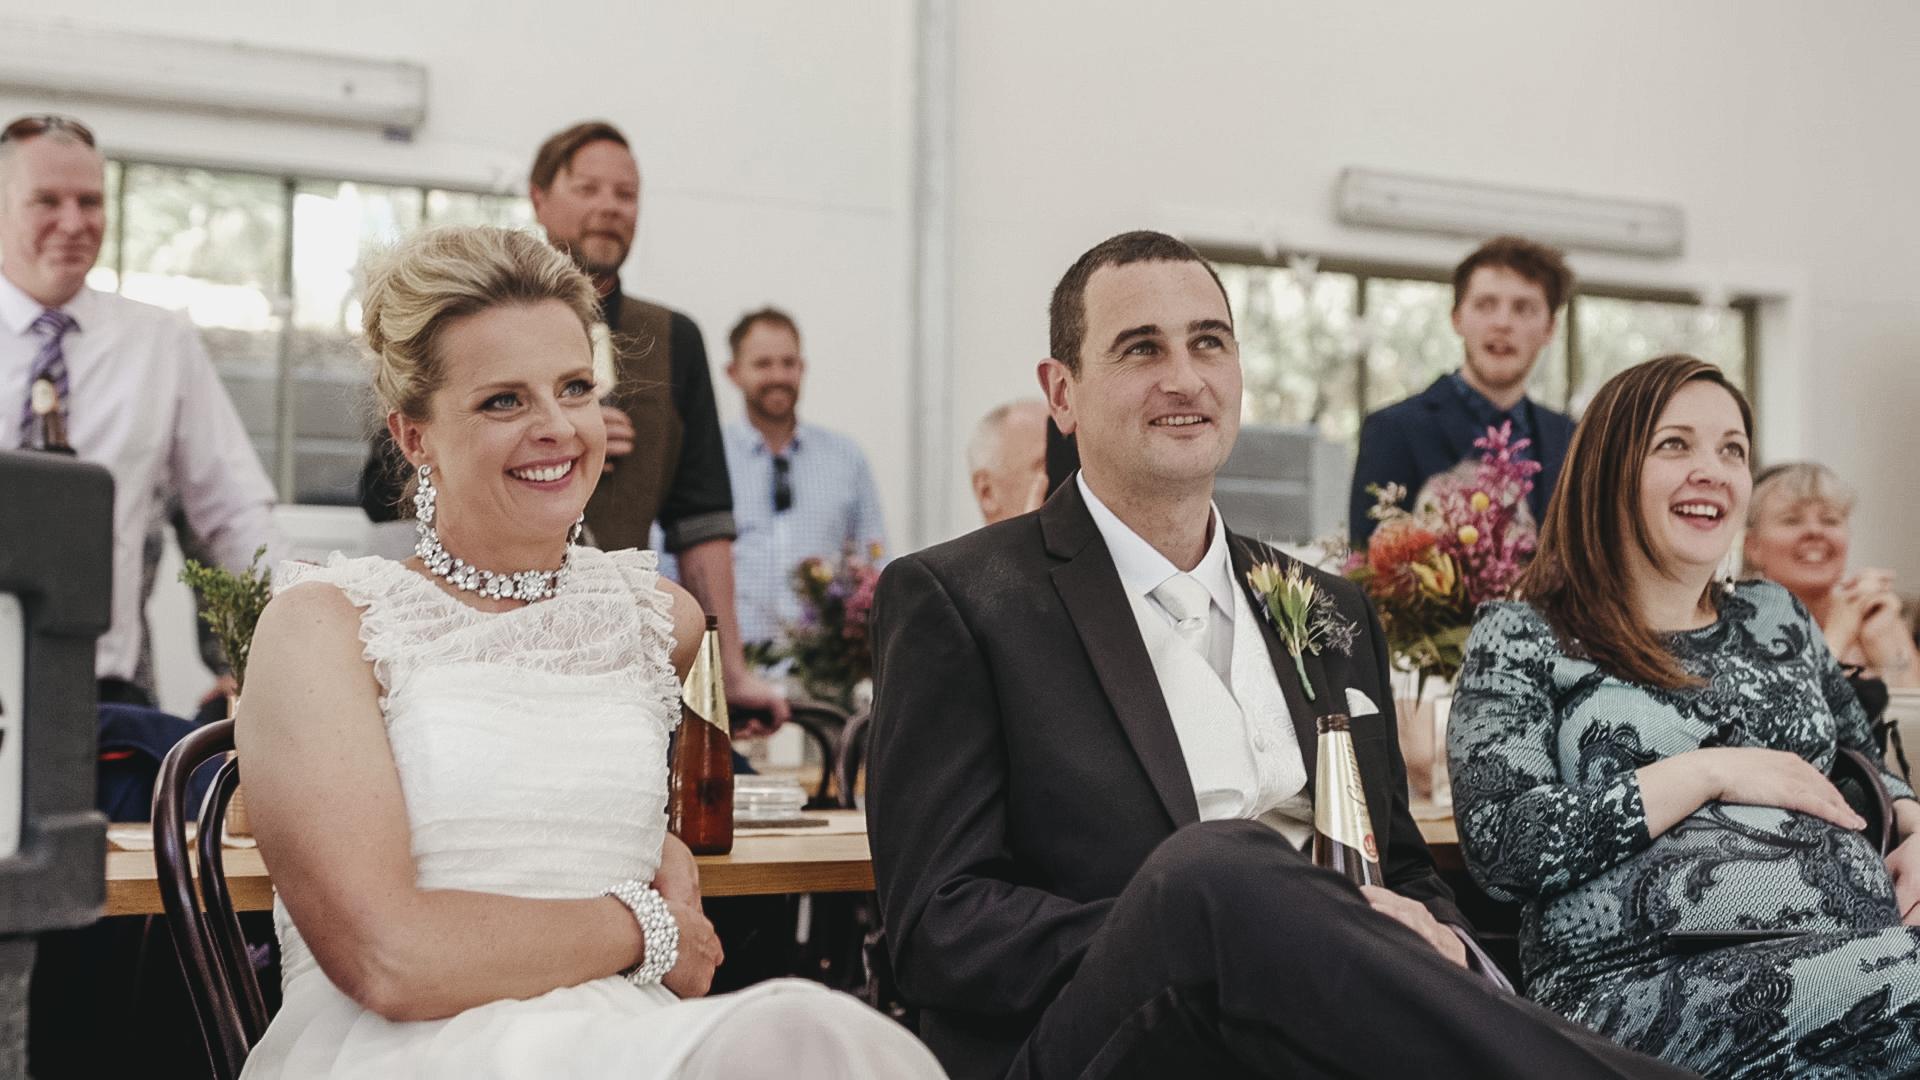 Georgette and Alan V2.00_02_53_01.Still010.jpg